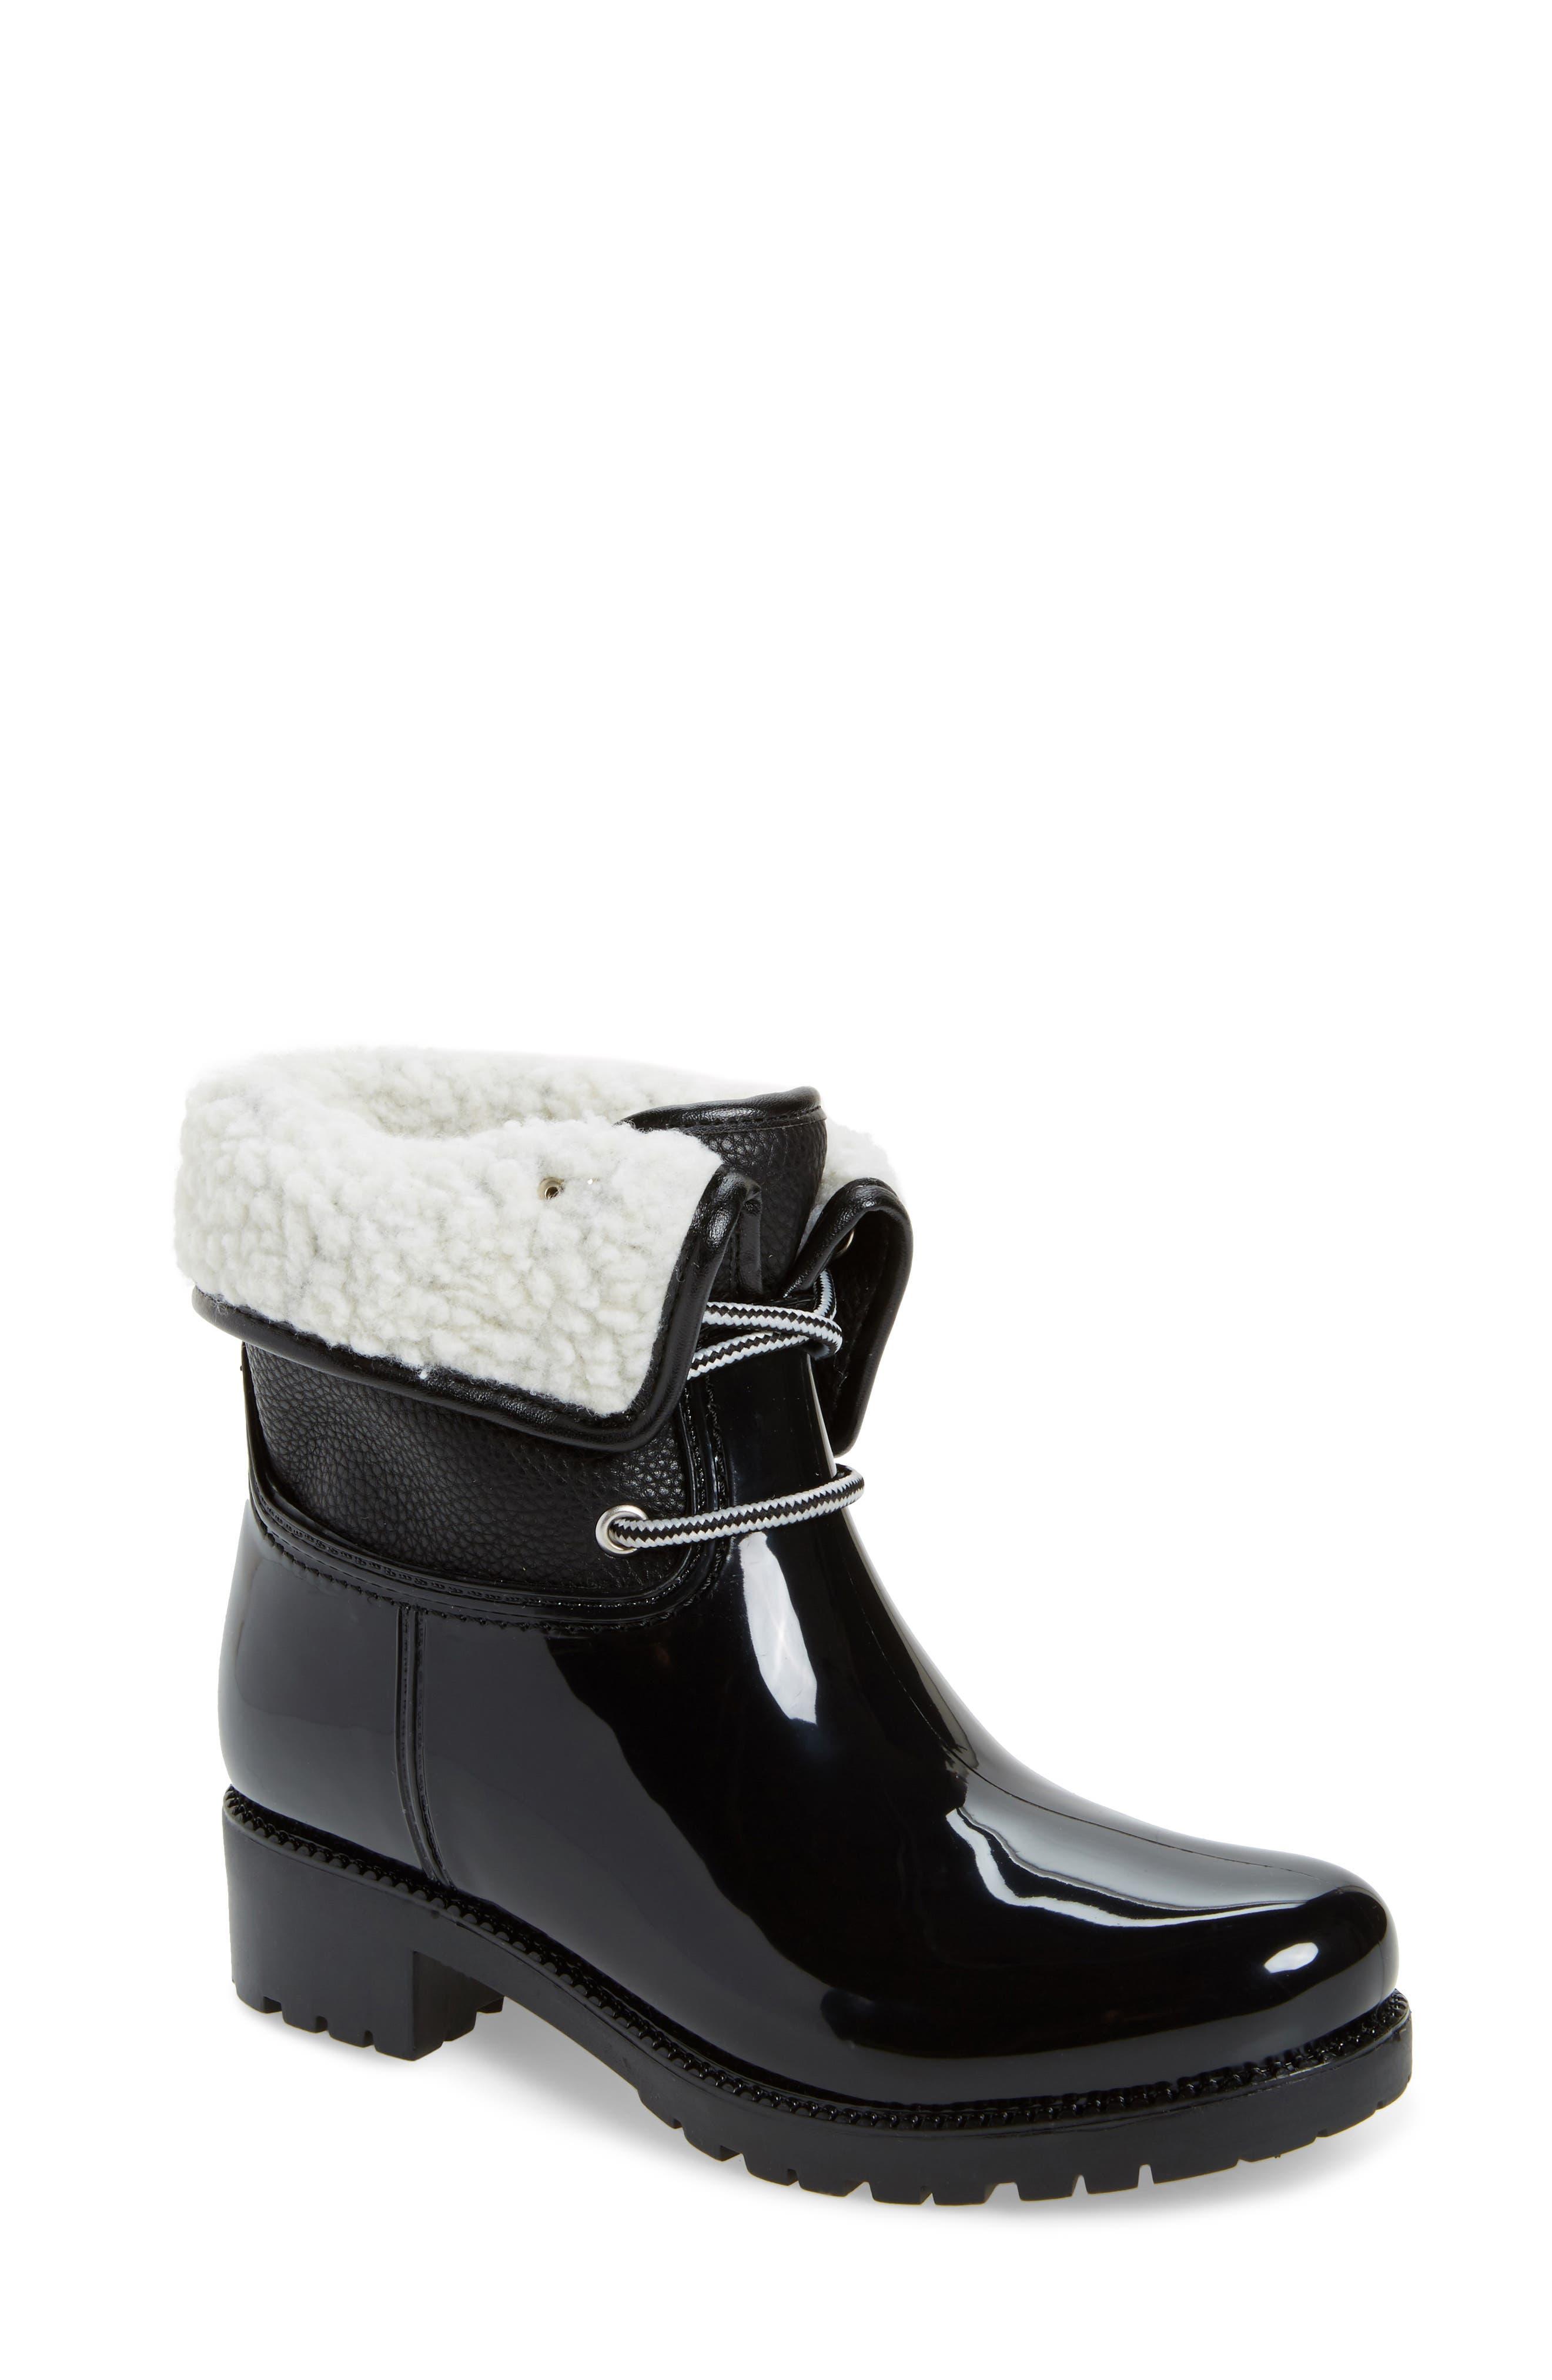 Calgary Faux Shearling Water Resistant Boot,                             Main thumbnail 1, color,                             BLACK